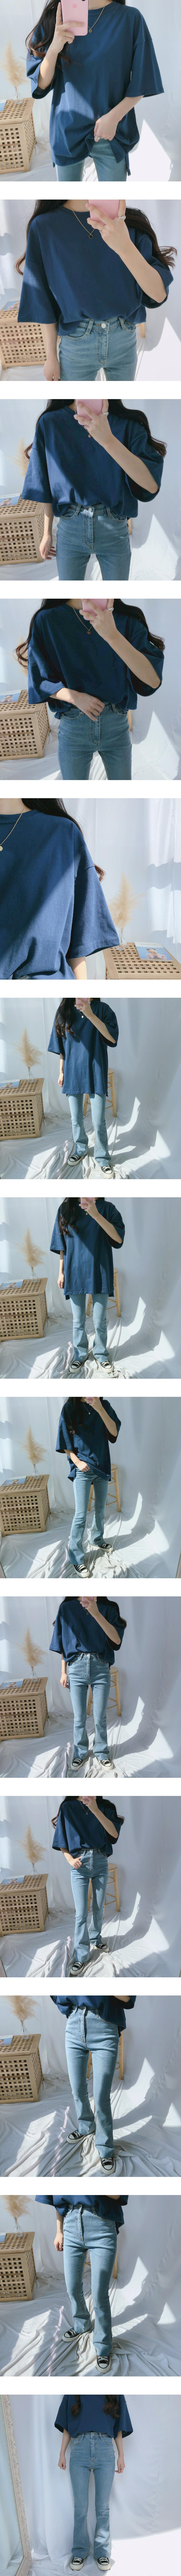 537 Boot cut high denim pants